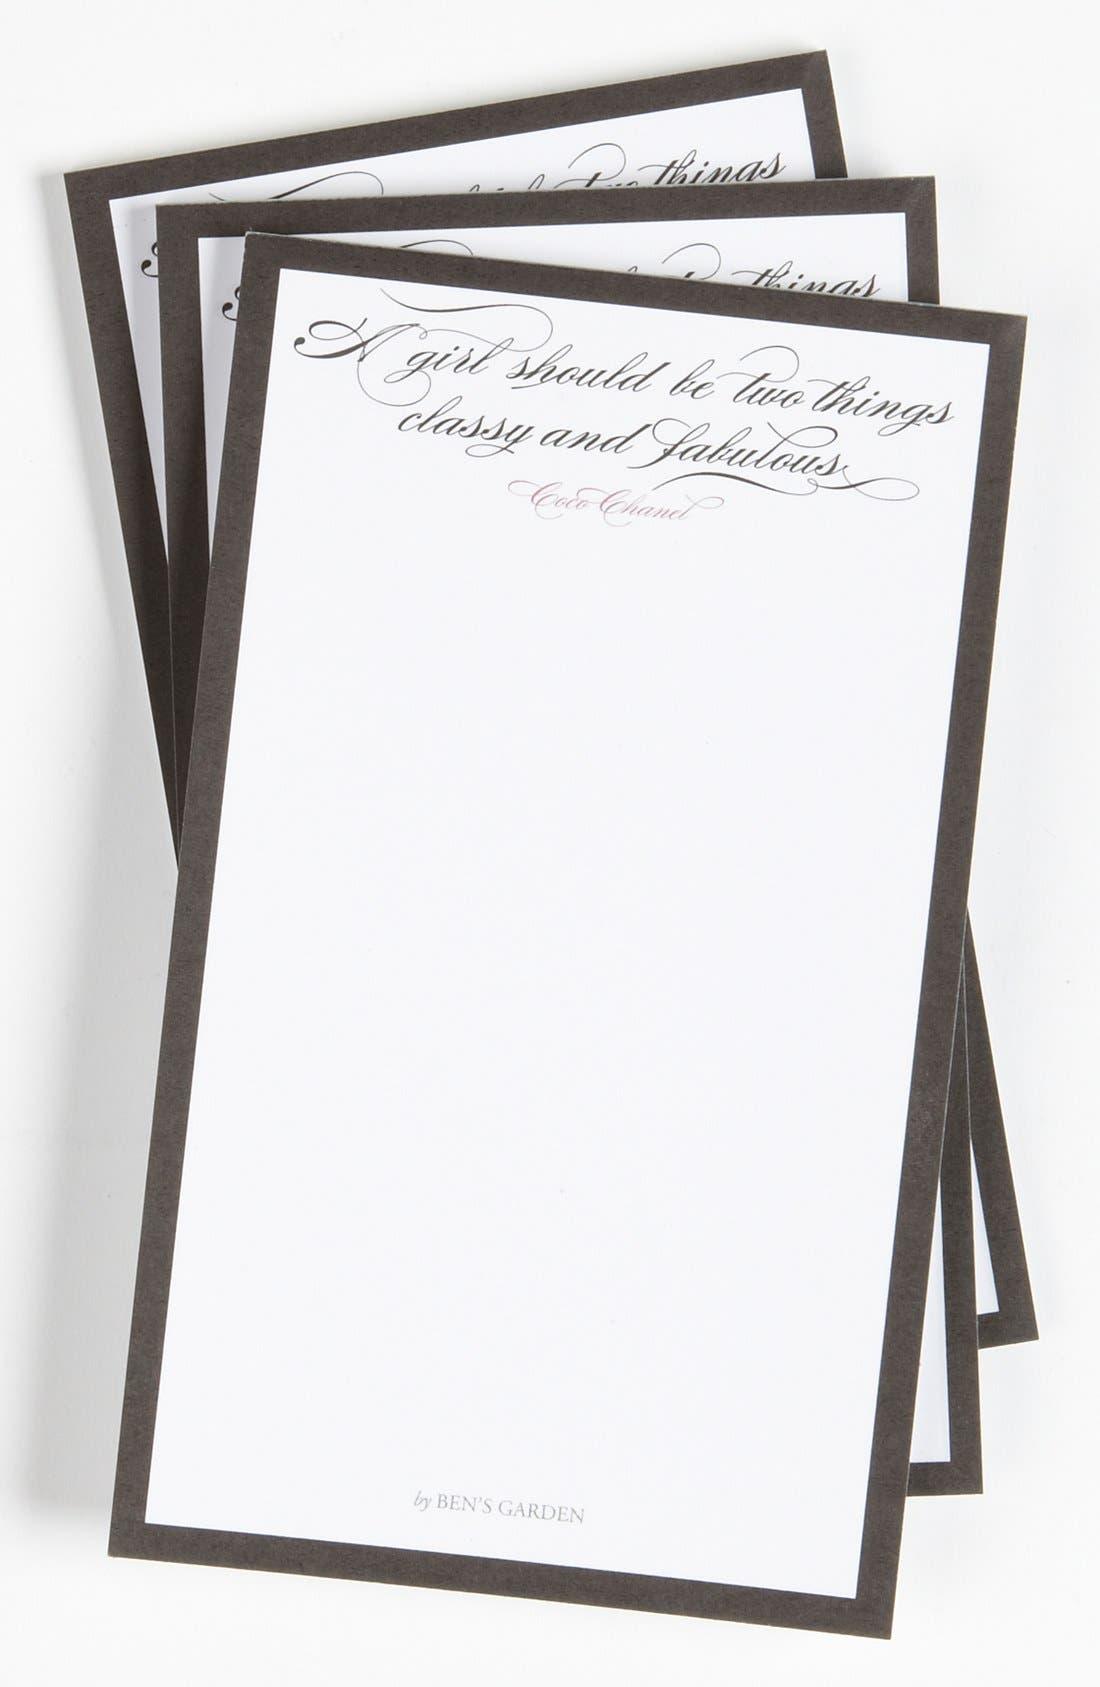 Main Image - Ben's Garden 'Classy and Fabulous' Notepad